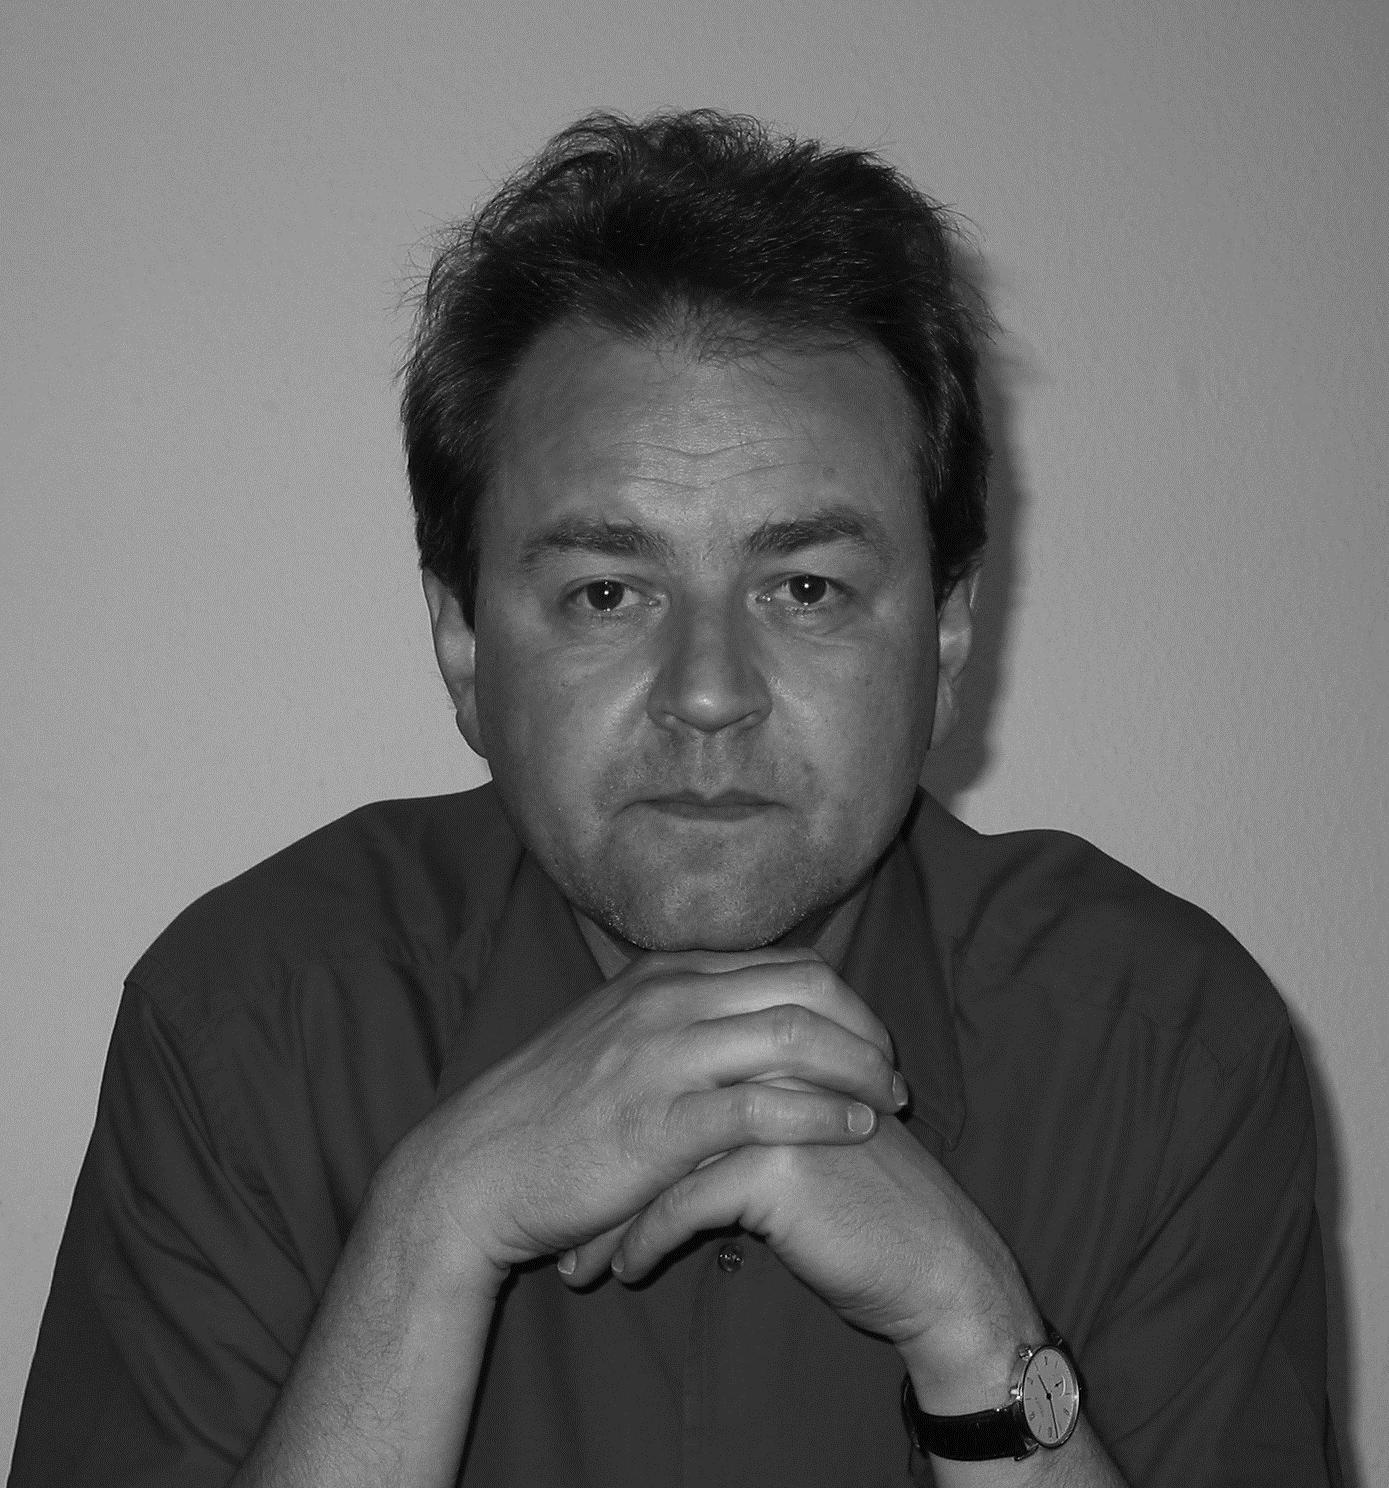 Peter_Kellert_2013